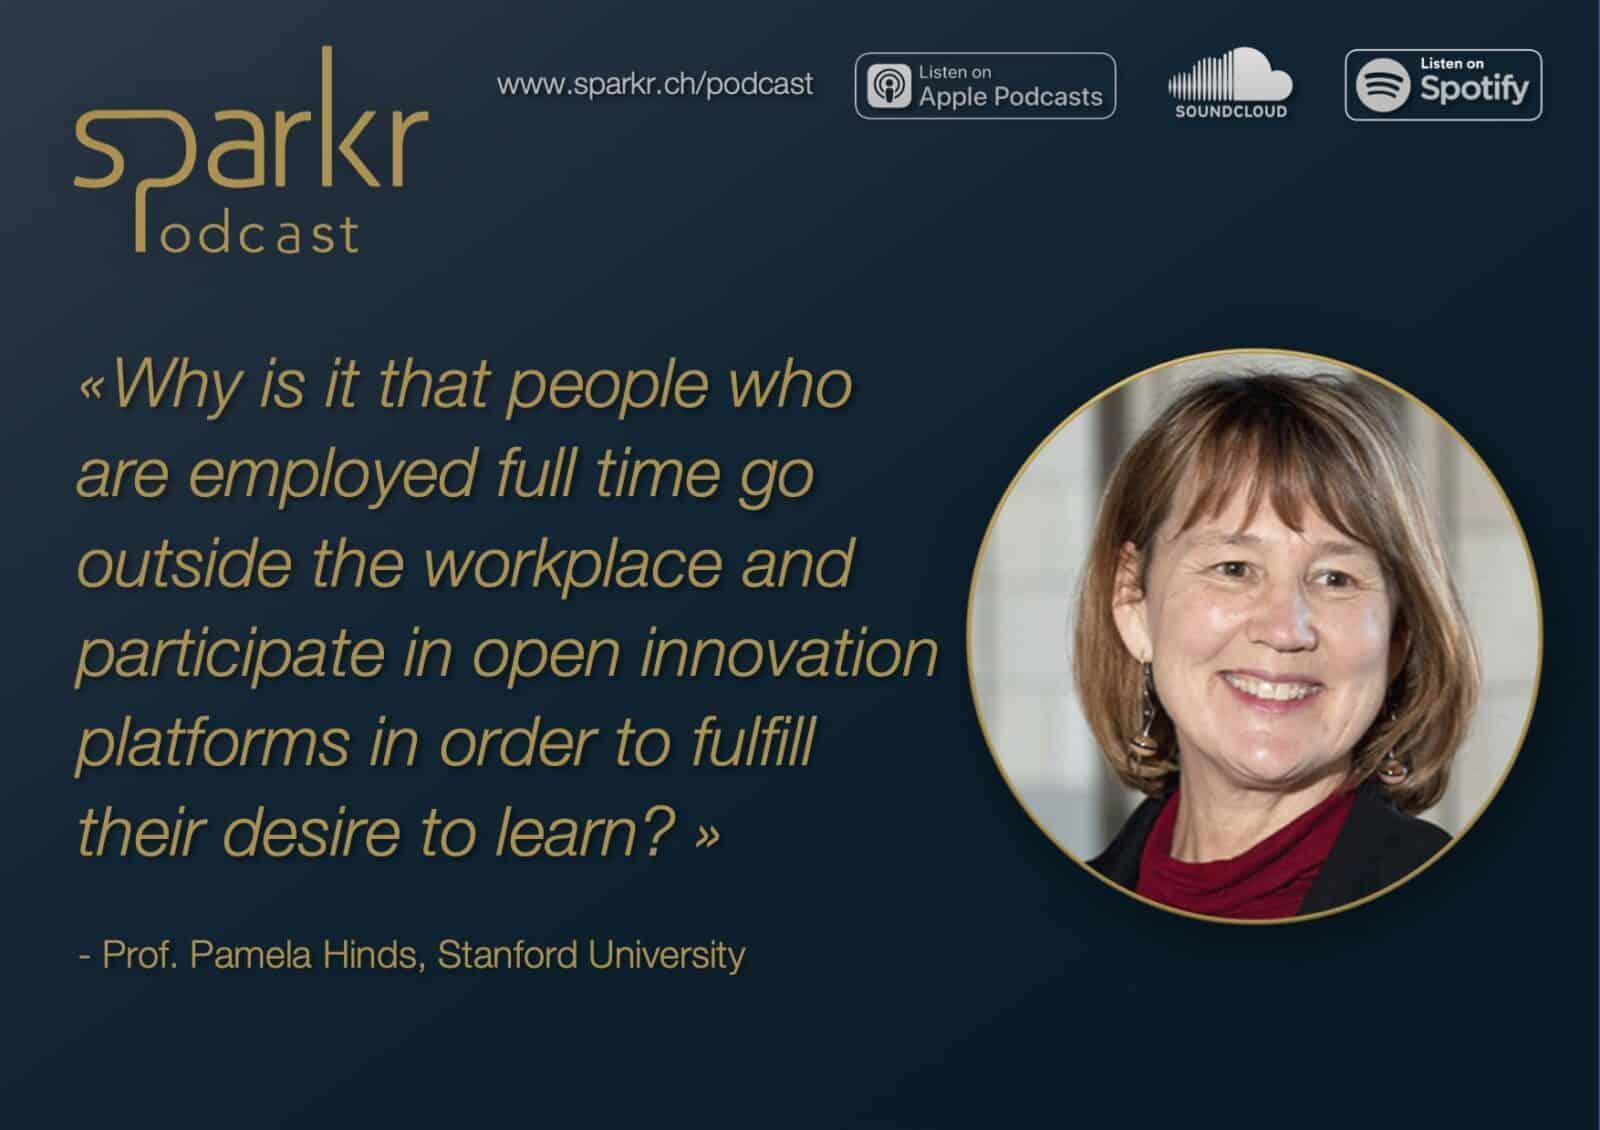 future of work best practice open innovation Pamela Hinds